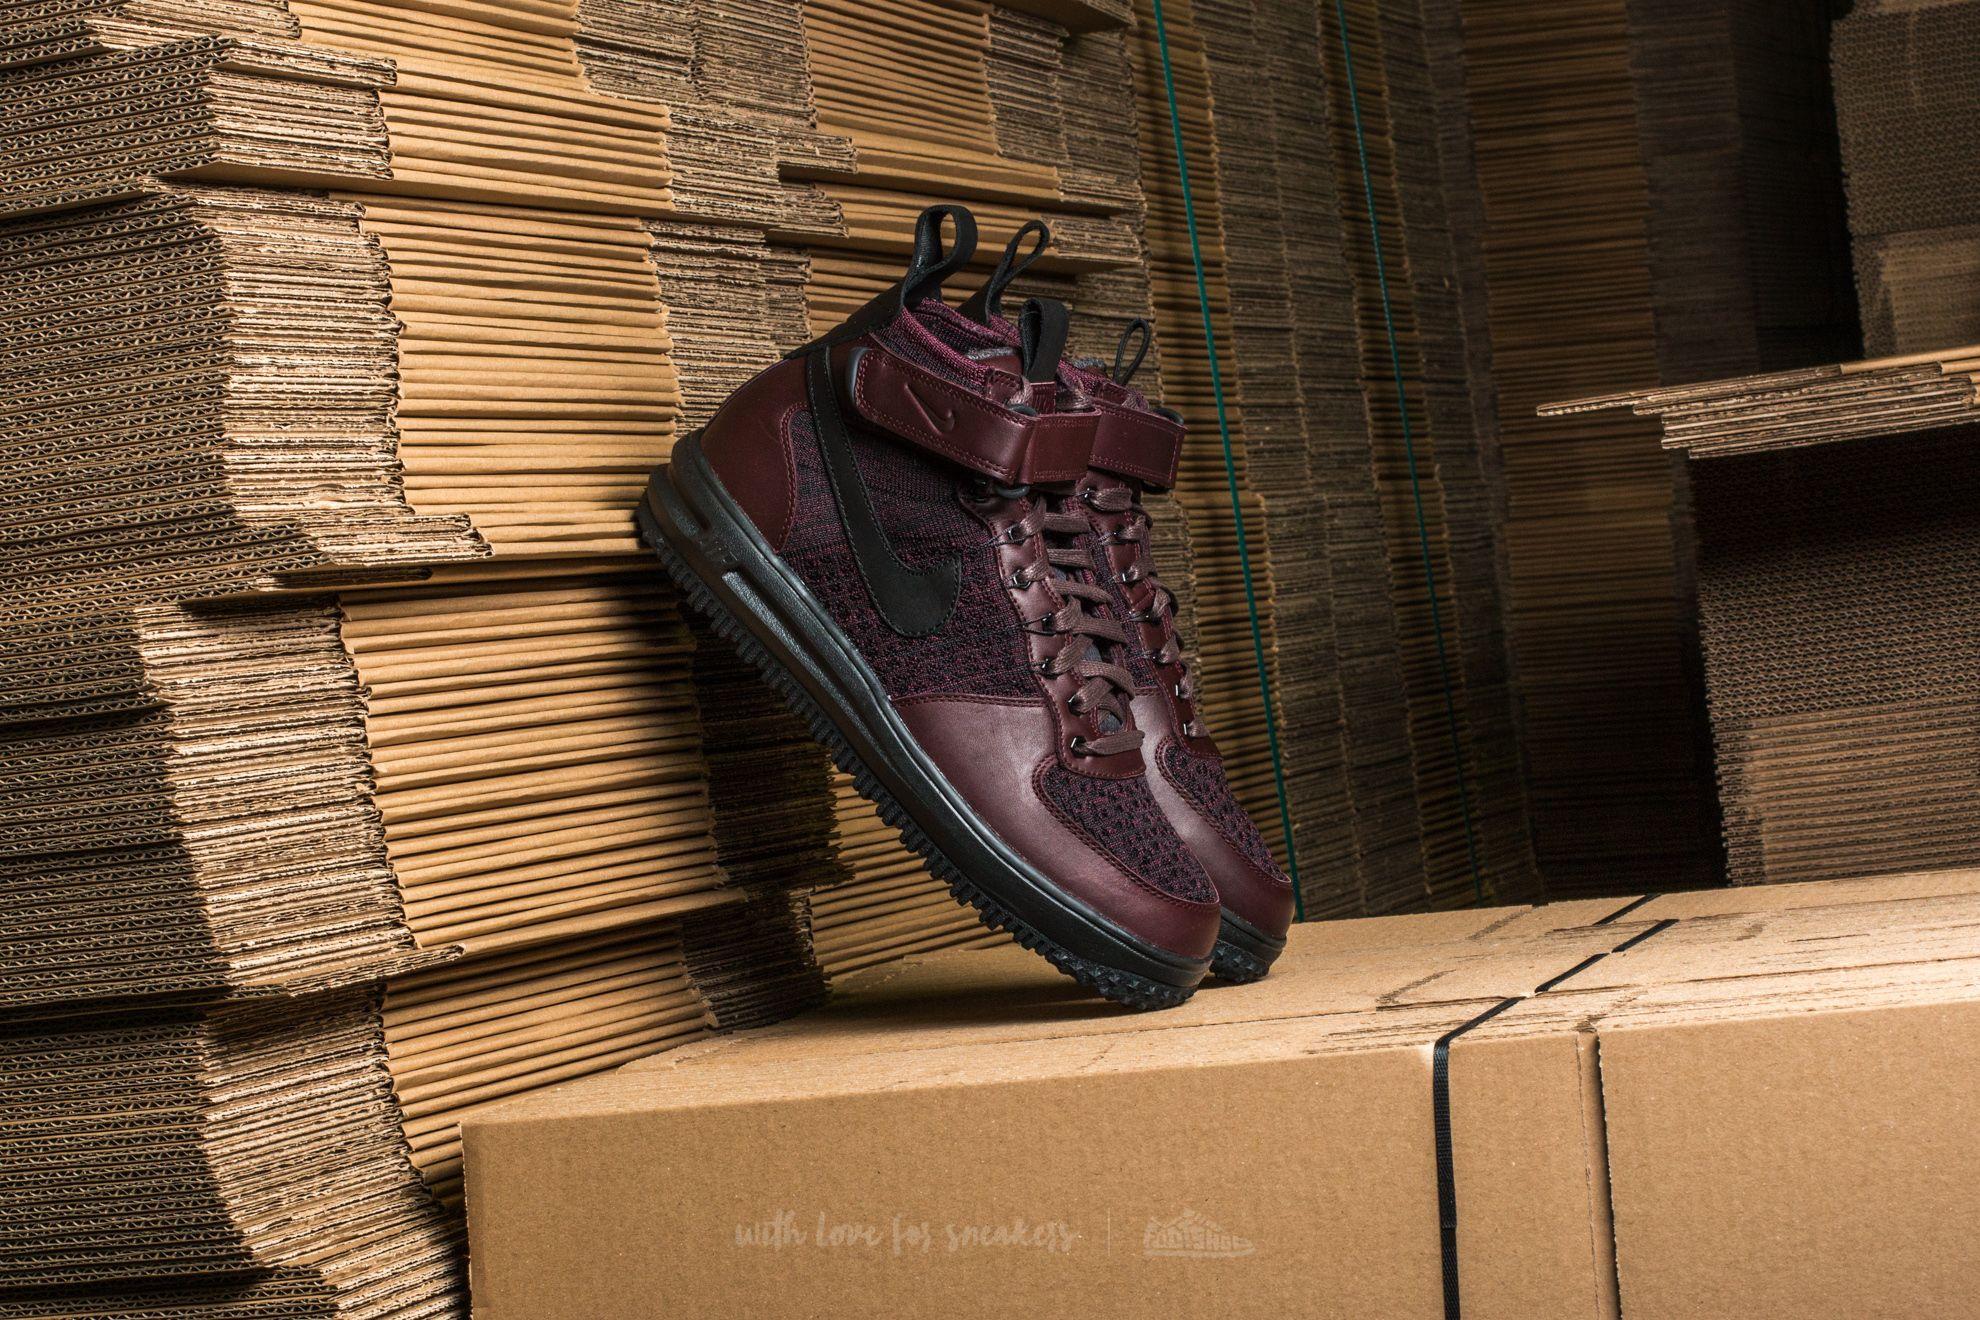 Nike Lunar Force 1 Flyknit Workboot Deep Burgundy/ Black